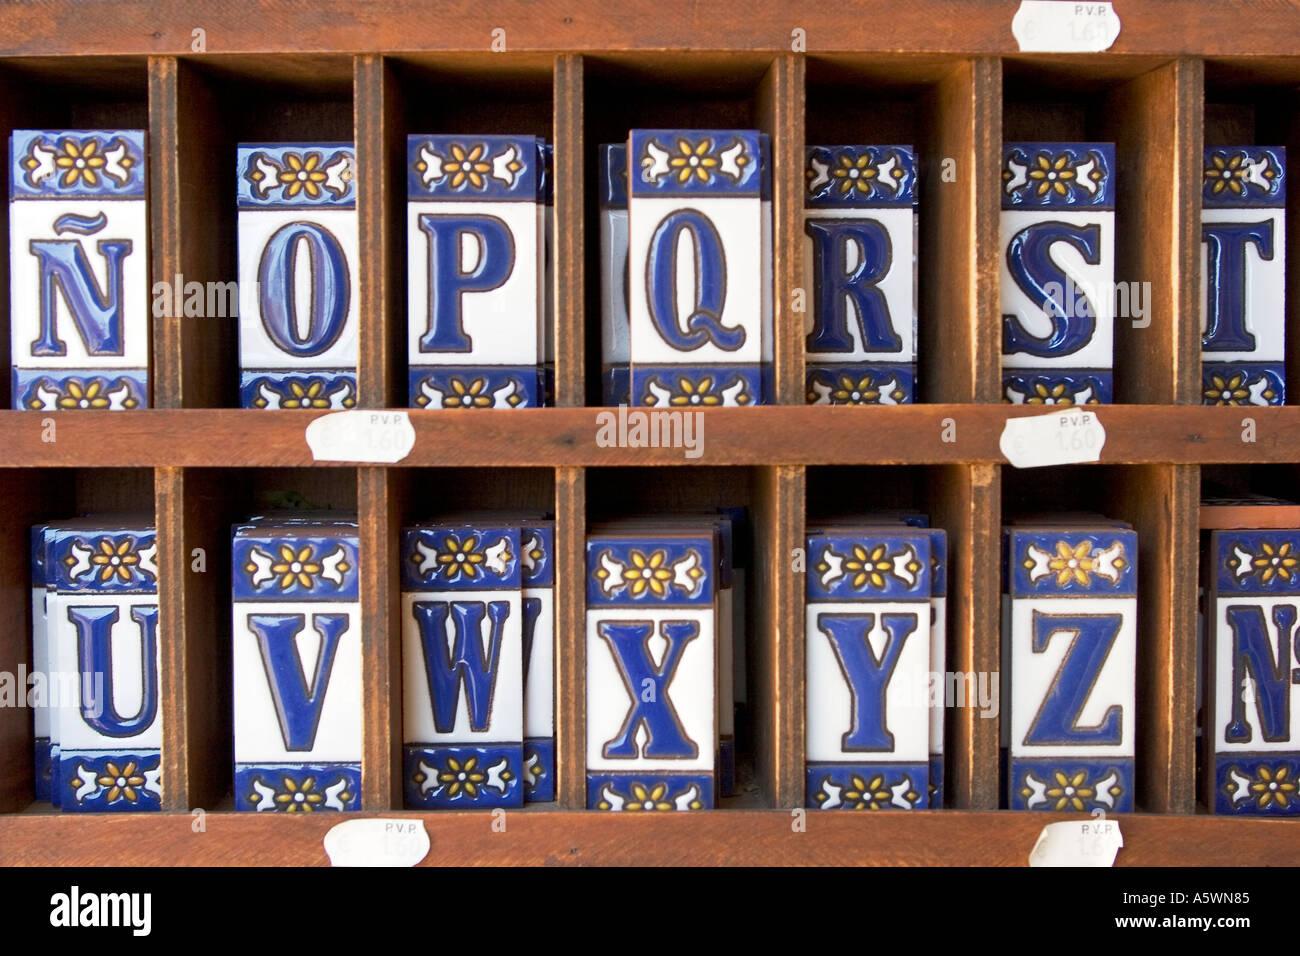 Ceramic letter tiles stock photos ceramic letter tiles stock ceramic tiles with letters stock image doublecrazyfo Gallery